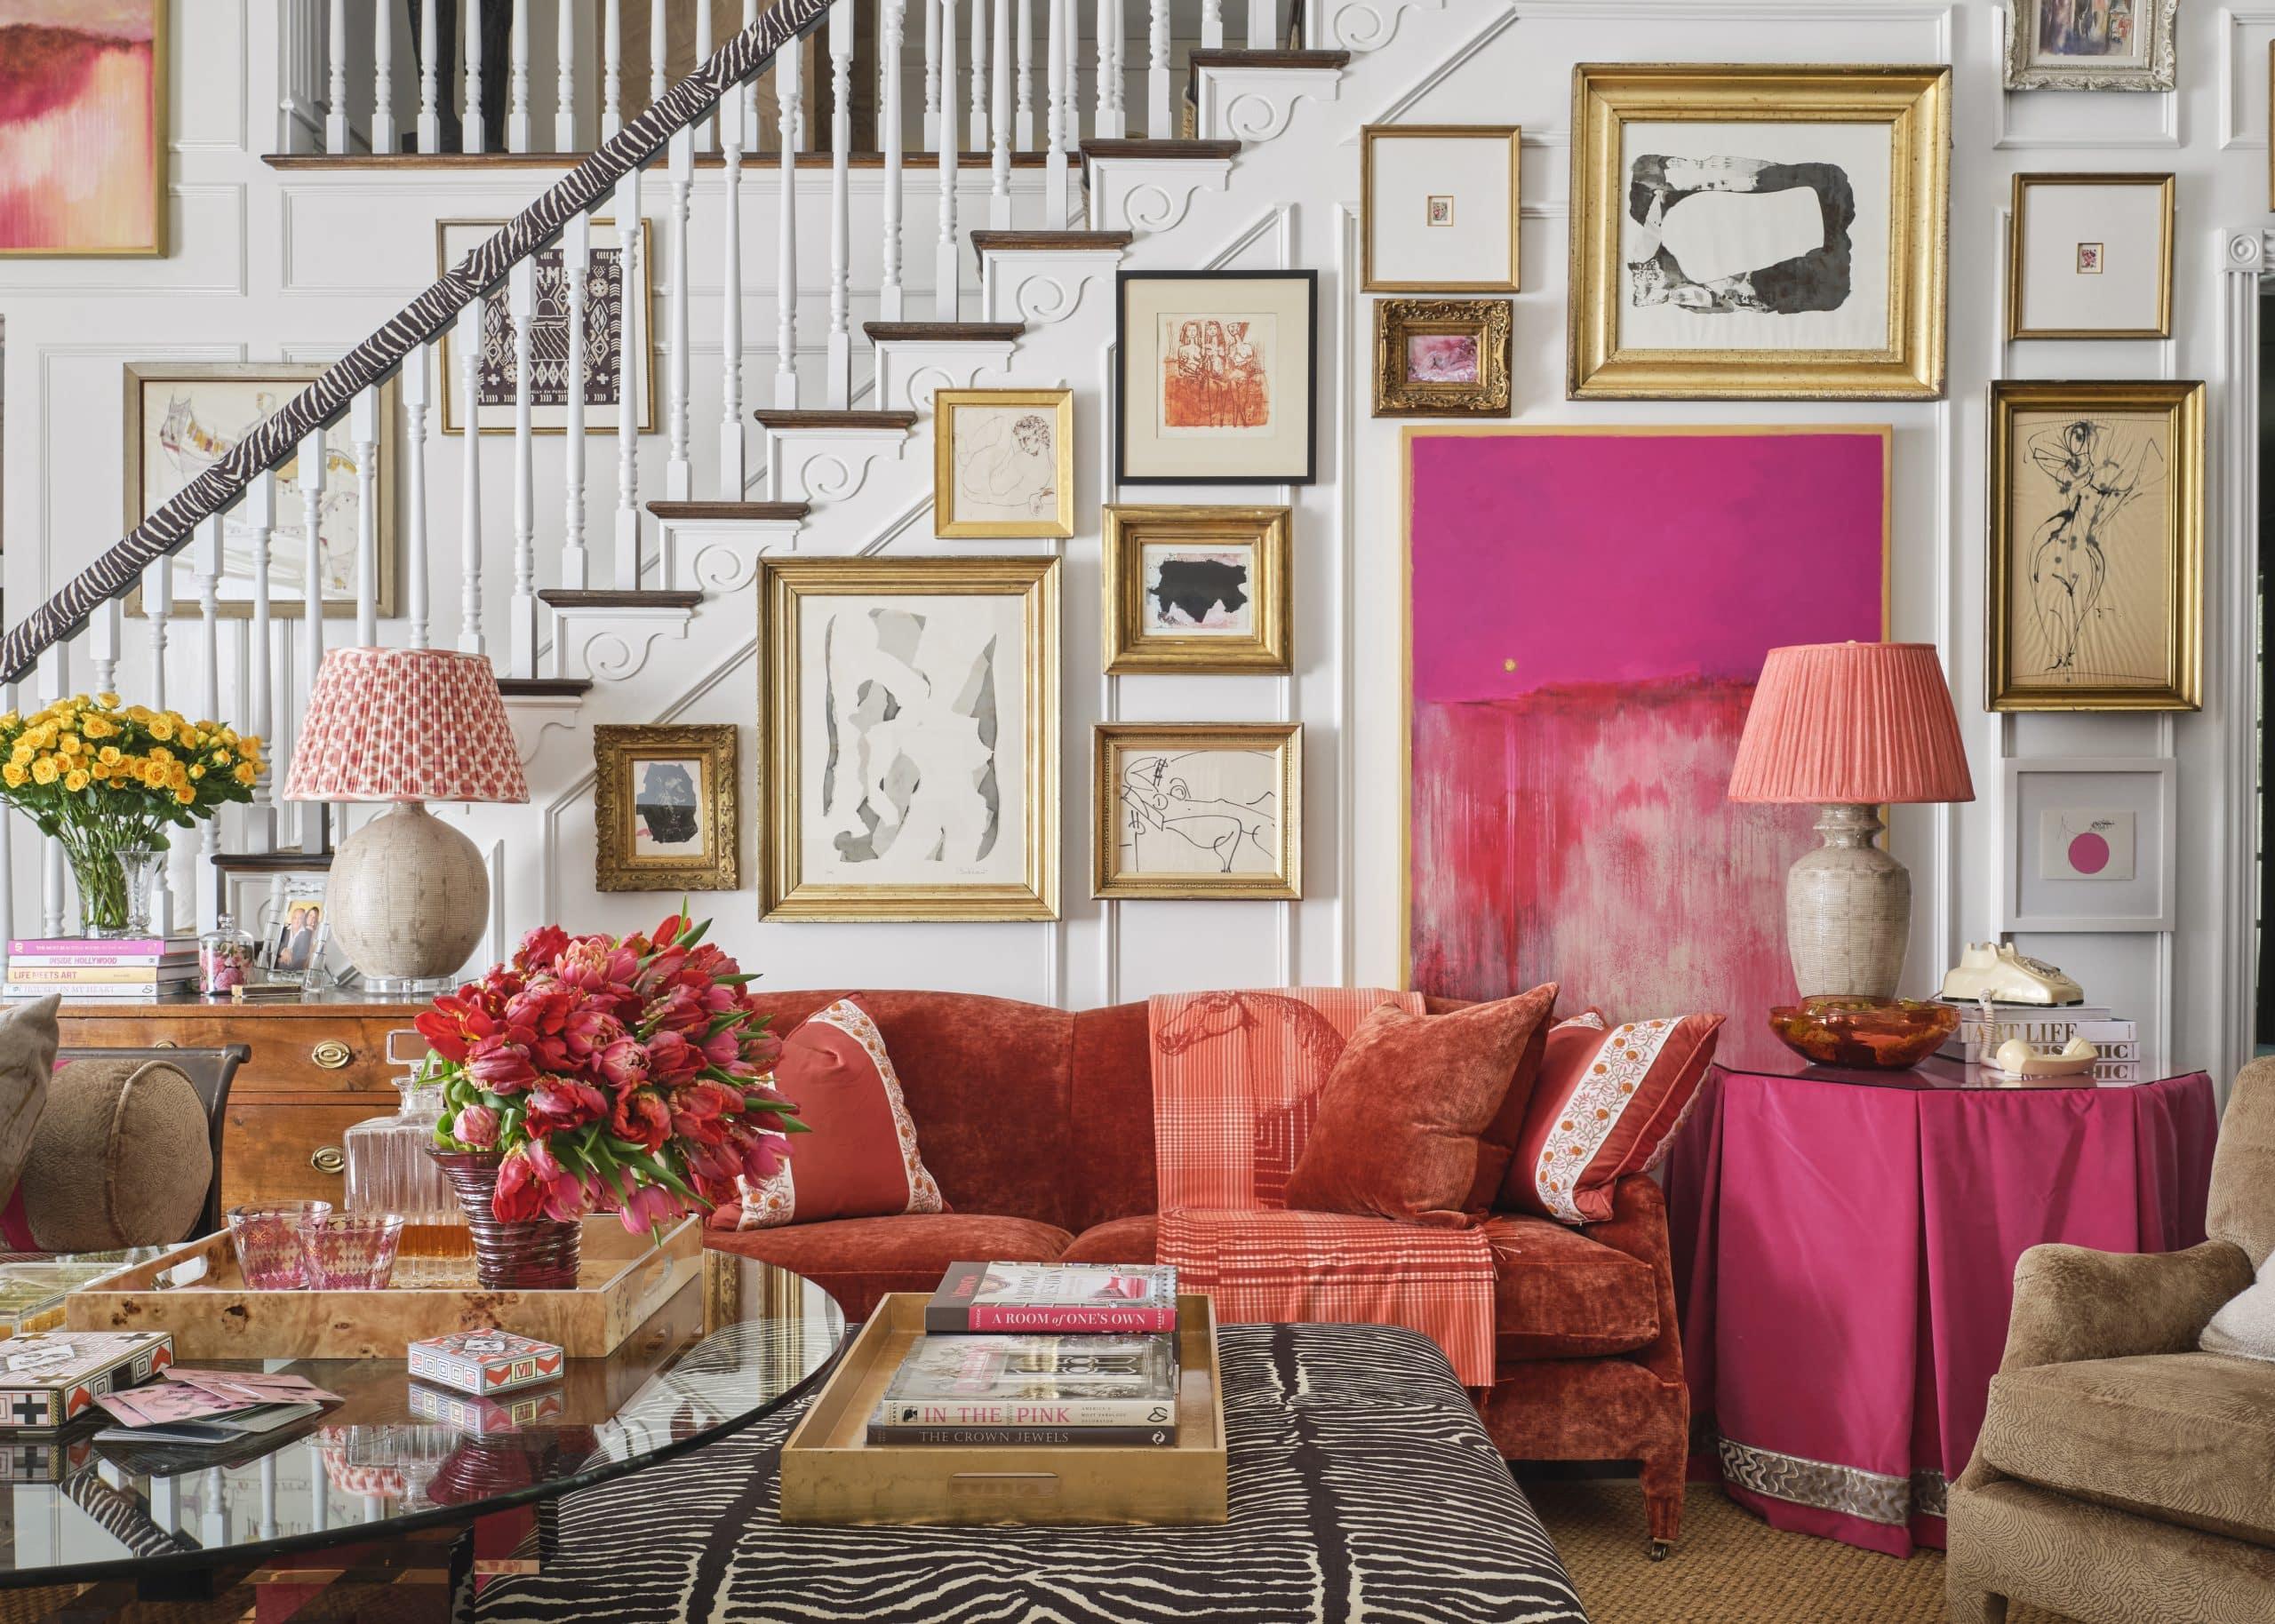 Family room designed by A. Lantz Design